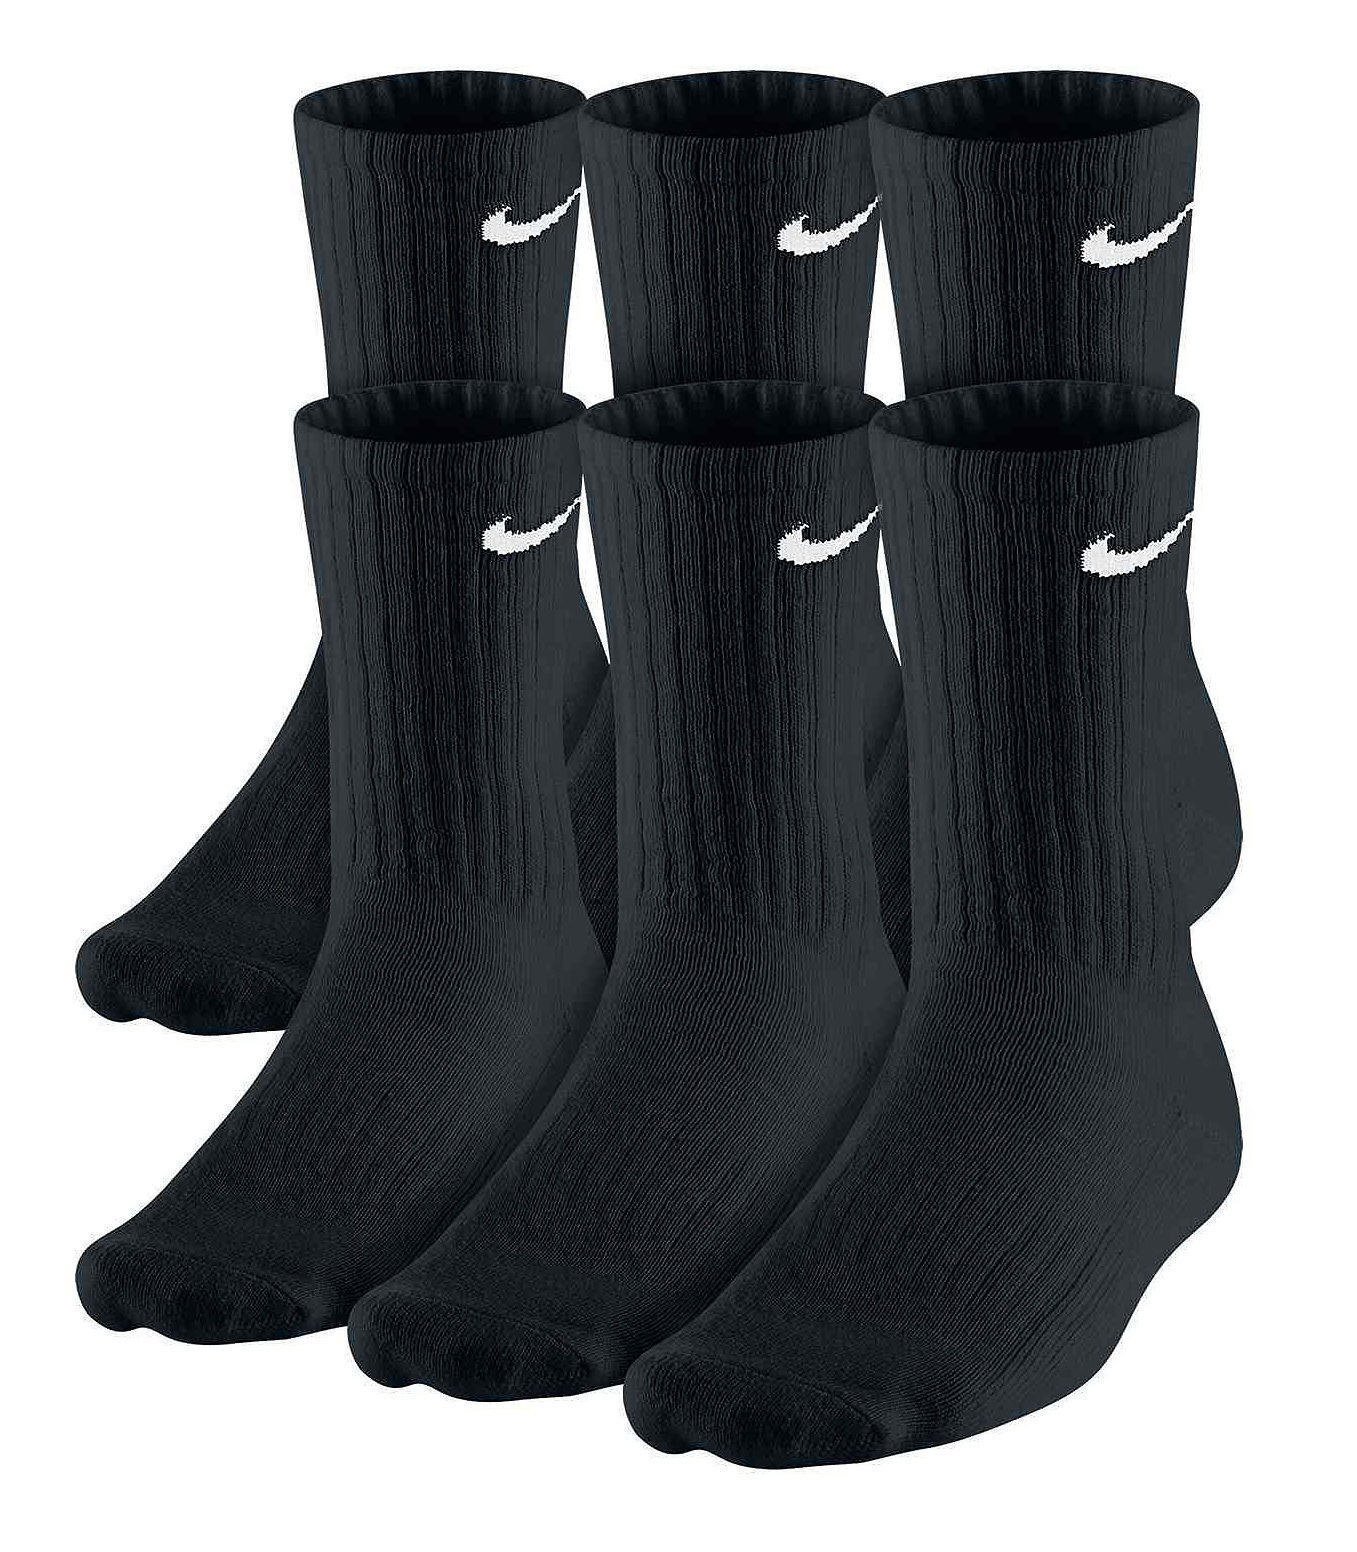 Nike 6 Pack NEW Men SZ Large 8-12 Black Performance Cushione